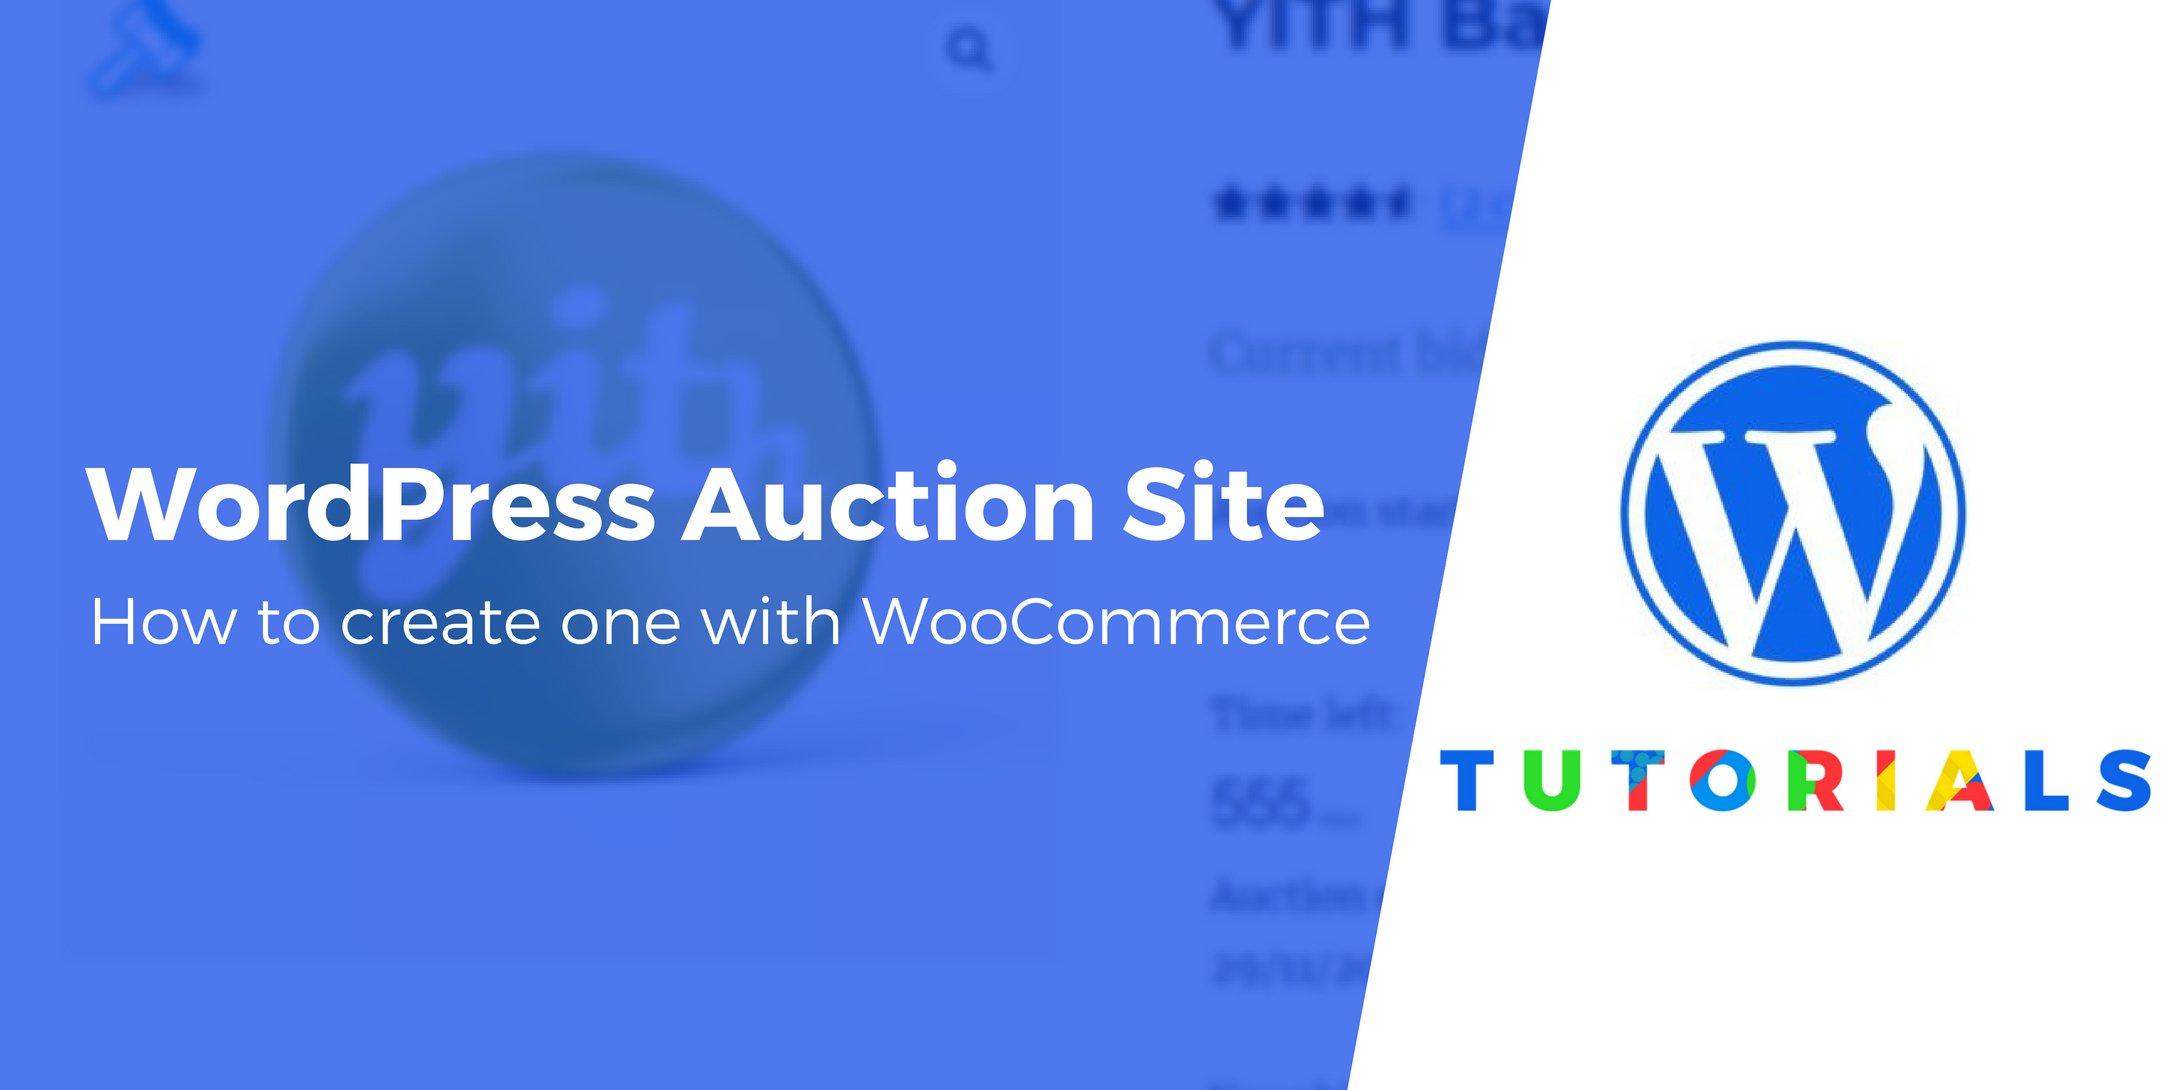 WordPress auction site